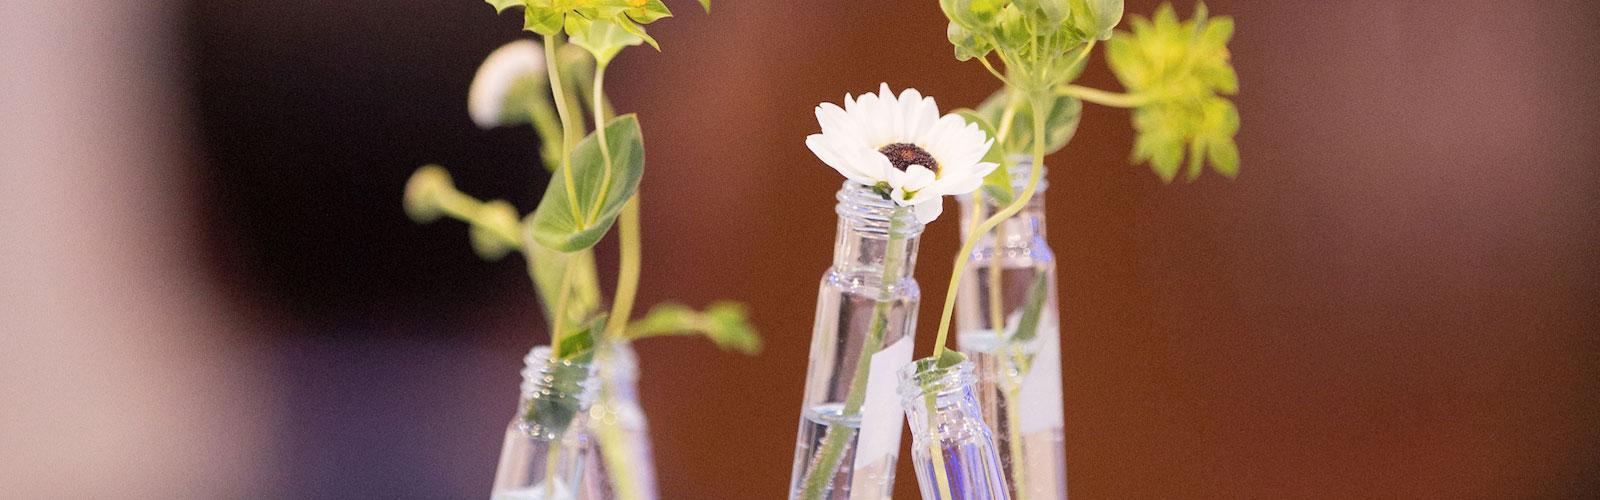 test tube flowers